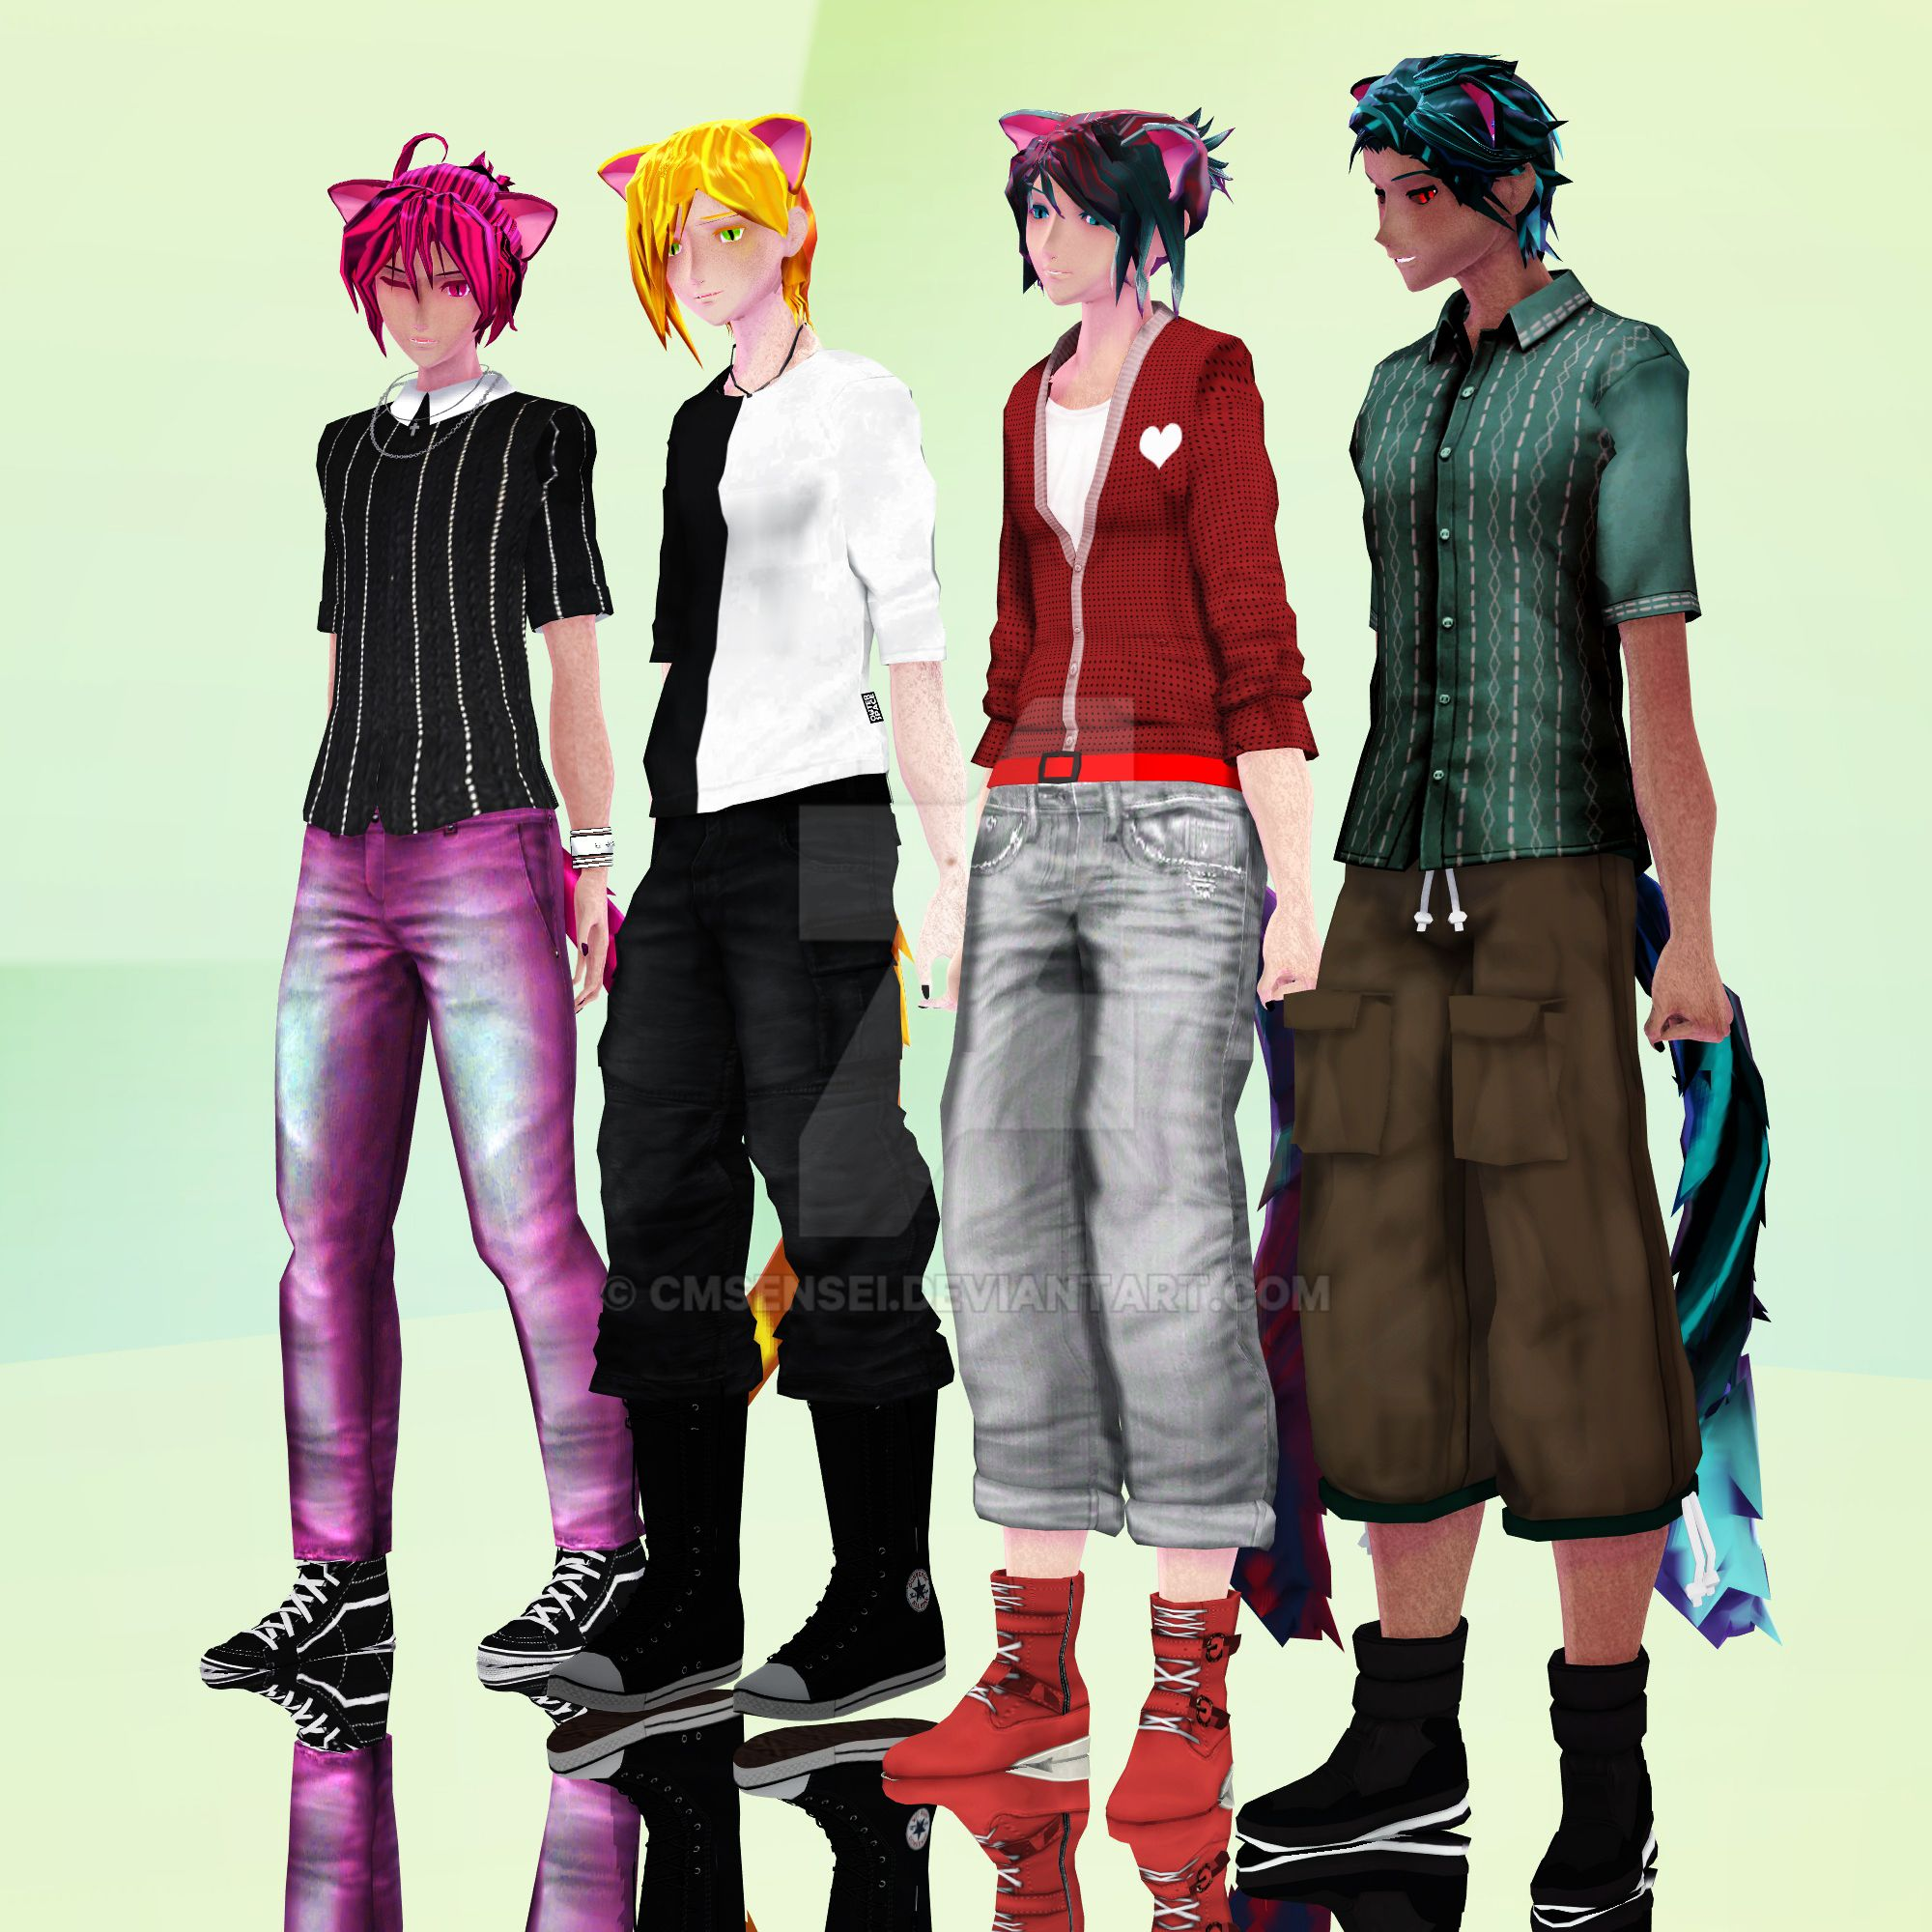 Neko Quad Alternative Outfits By Cmsensei On Deviantart